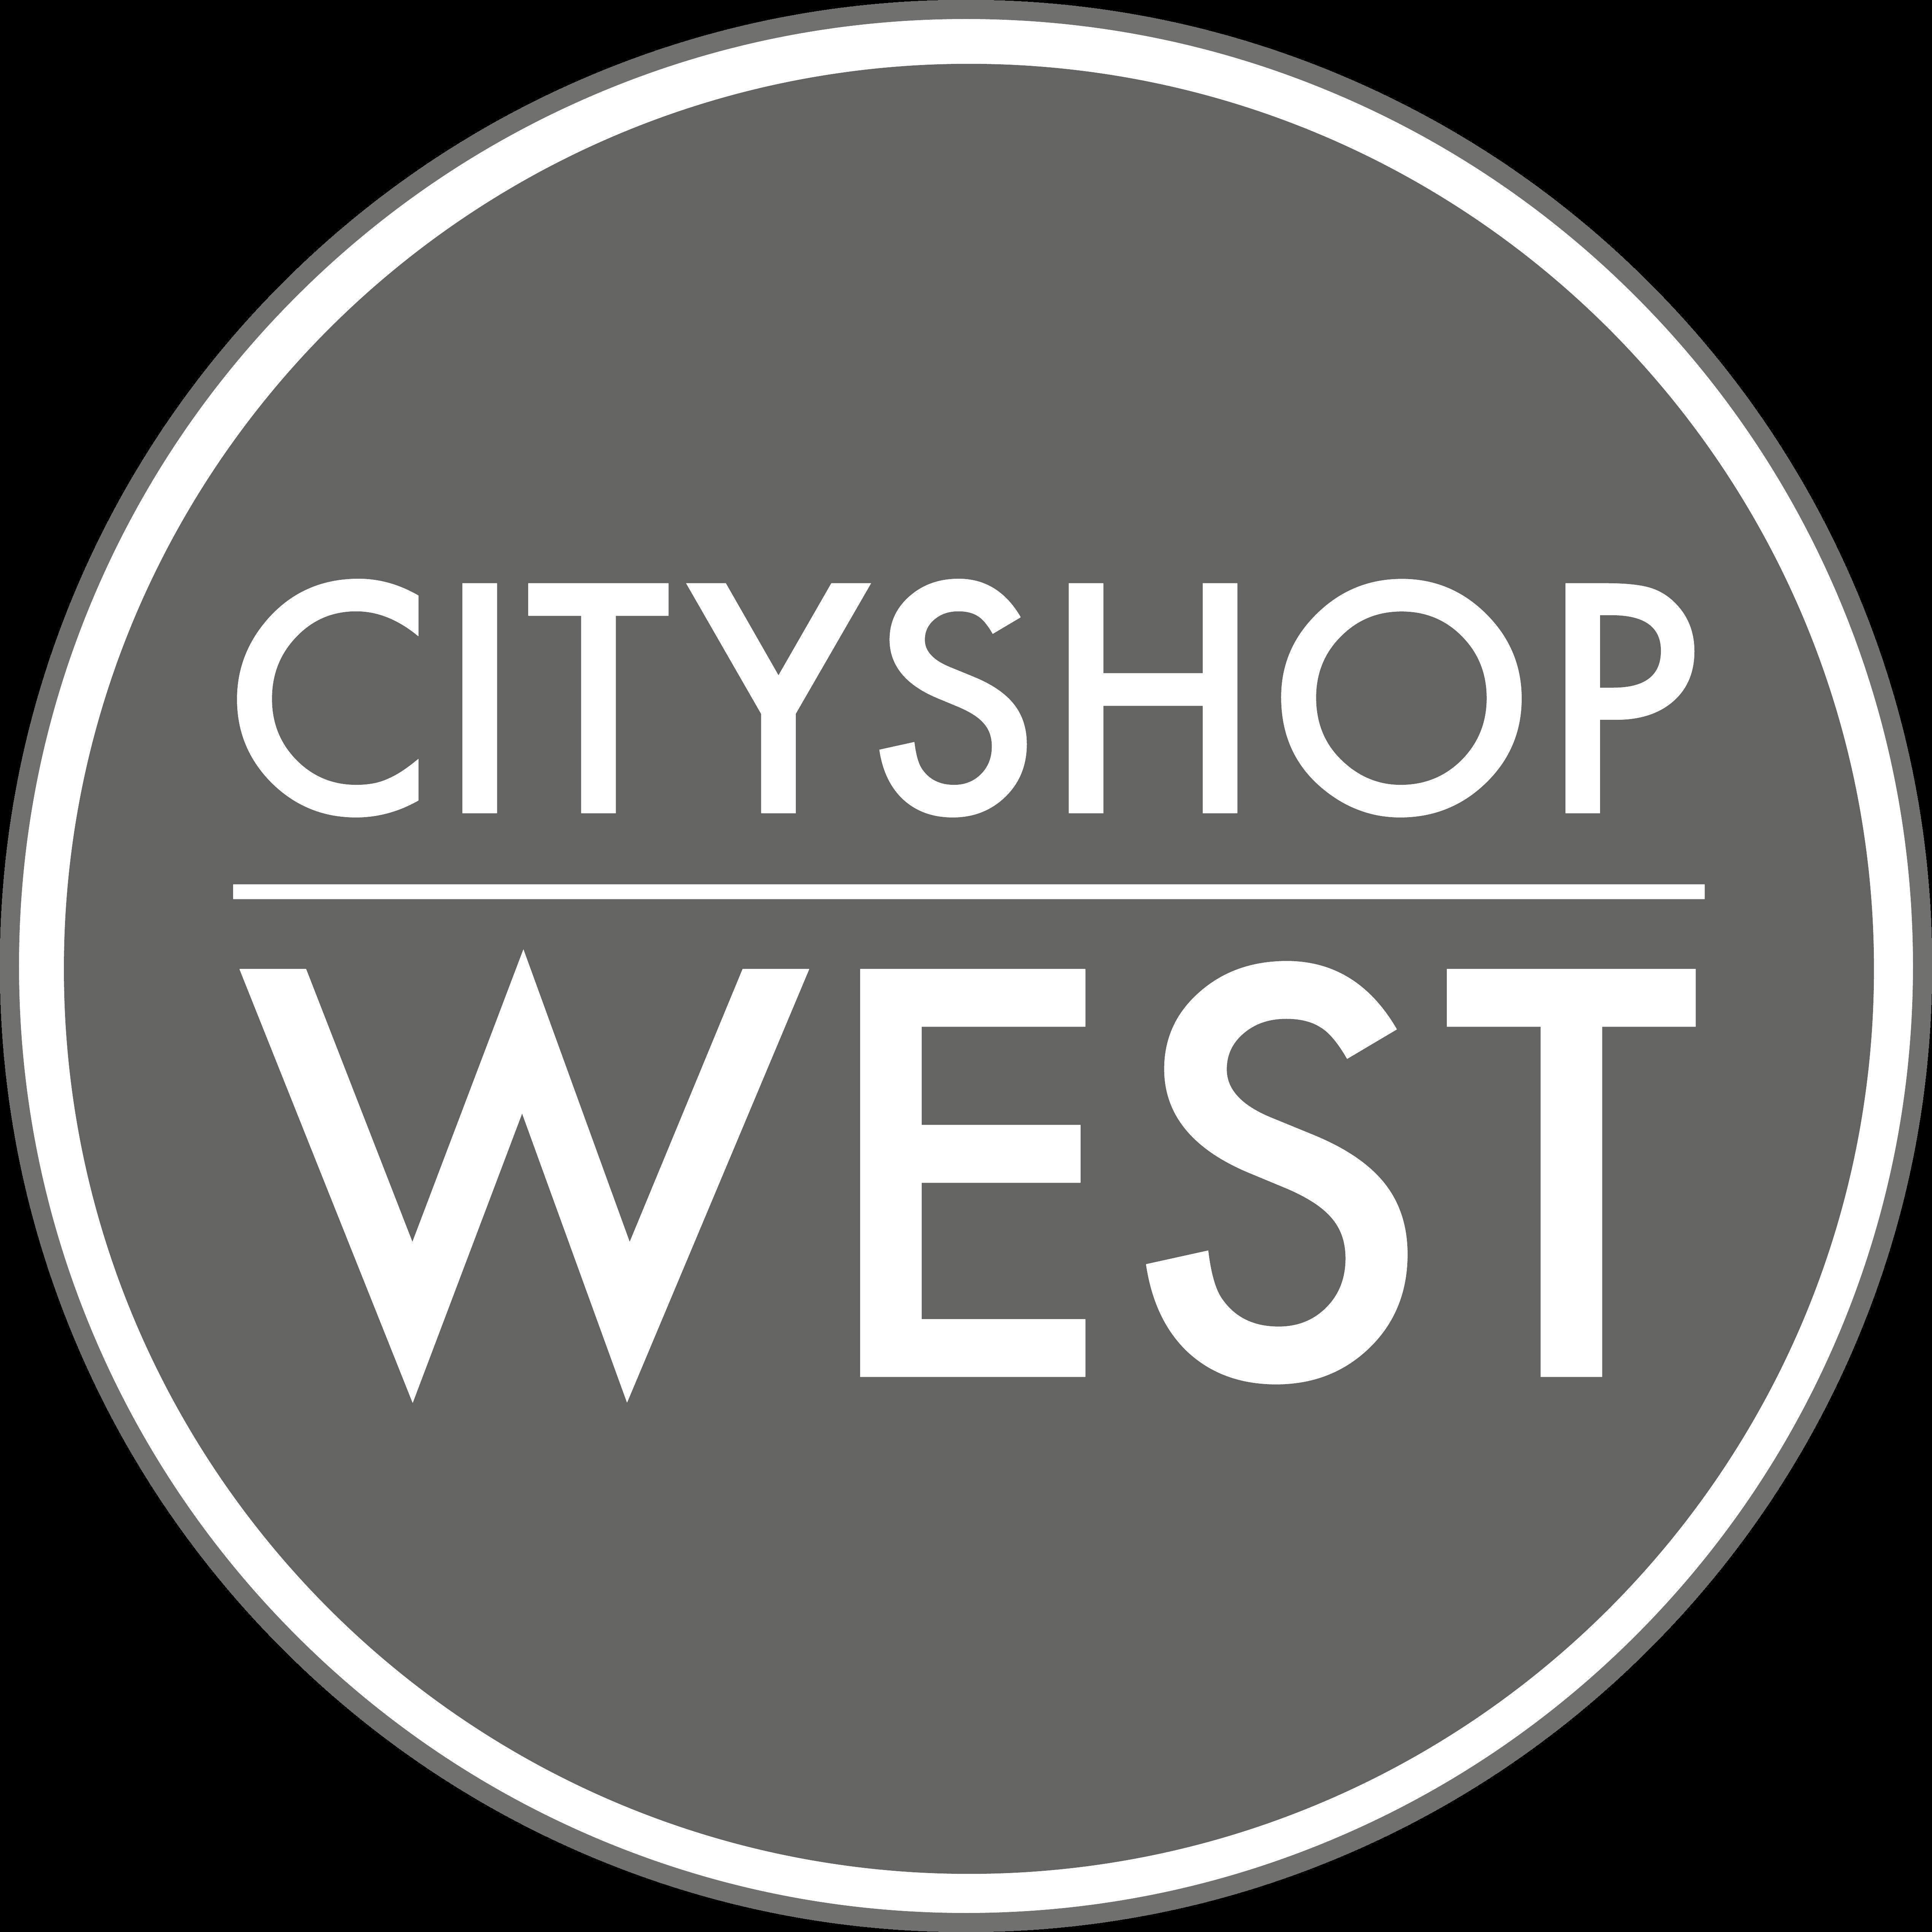 City Shop West Kiosk GmbH Wolfsburg